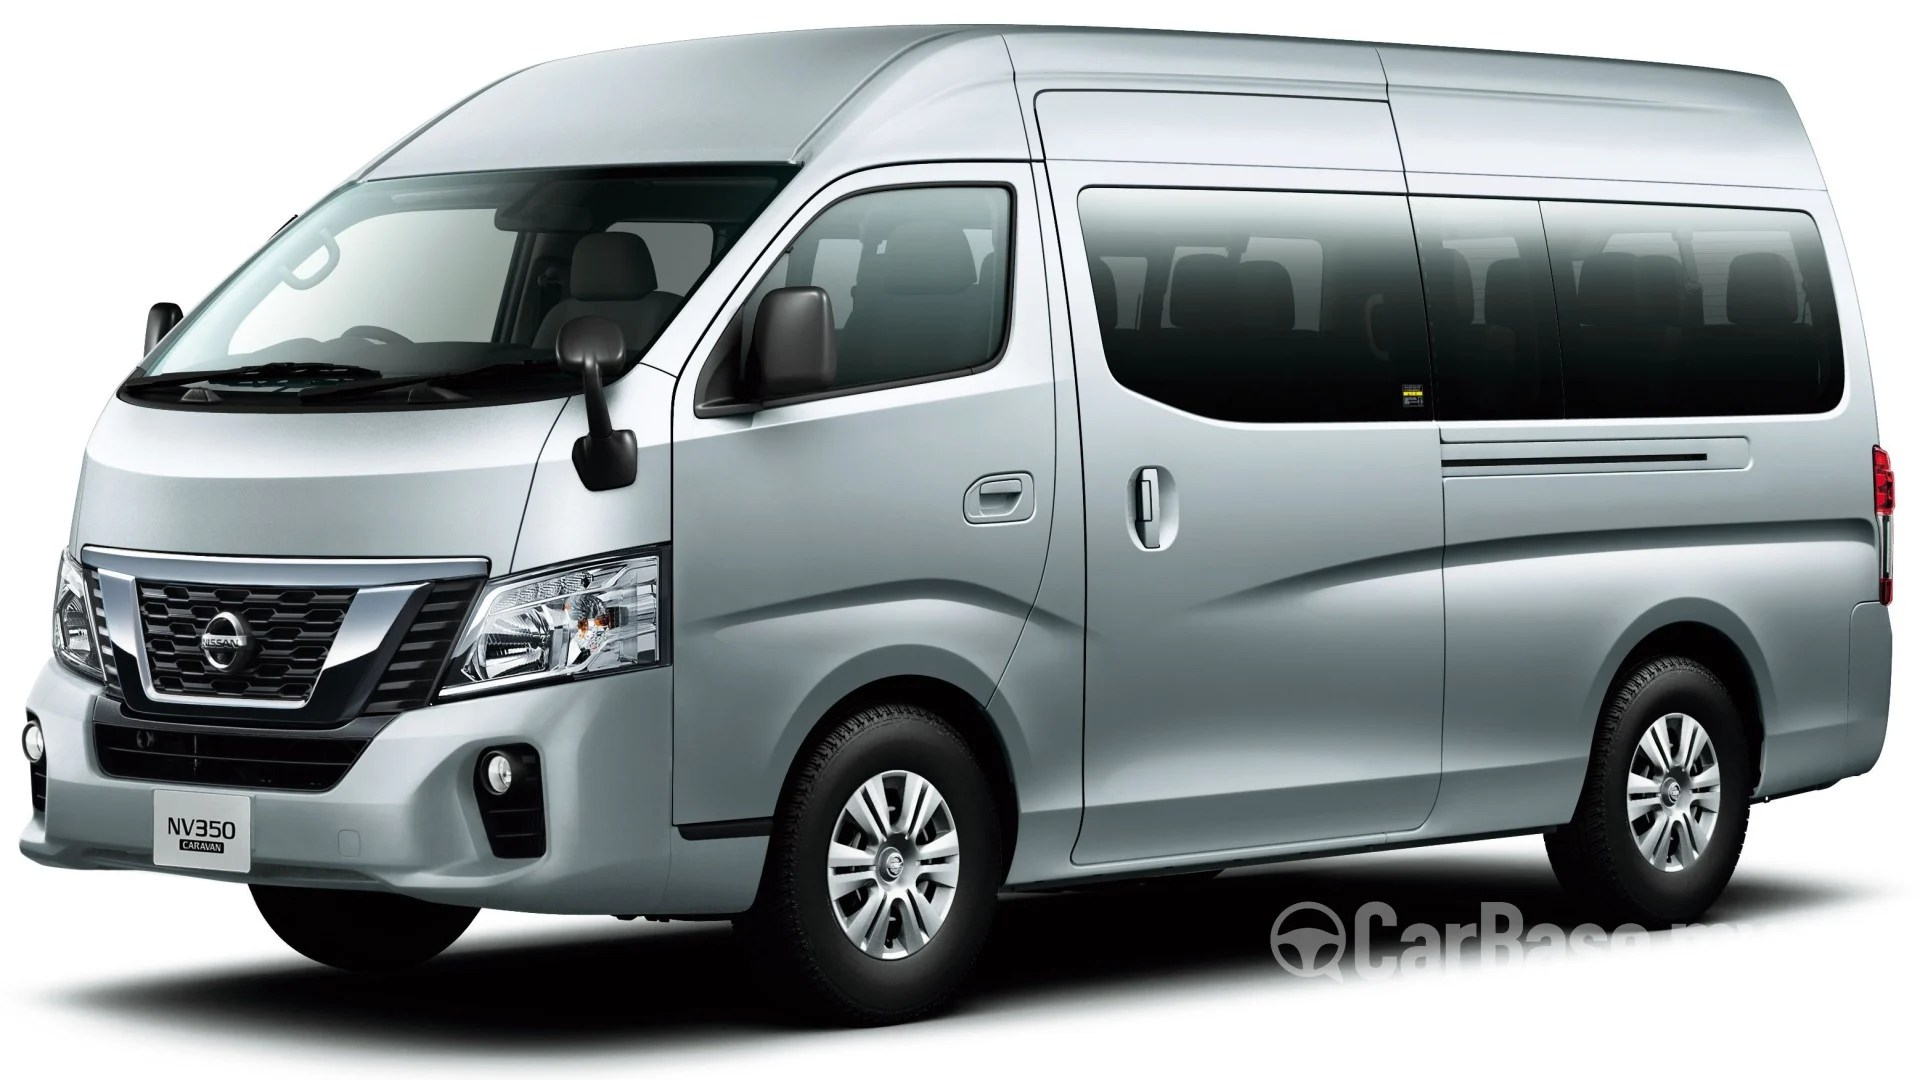 Nissan Nv350 Urvan E26 Facelift Exterior Image